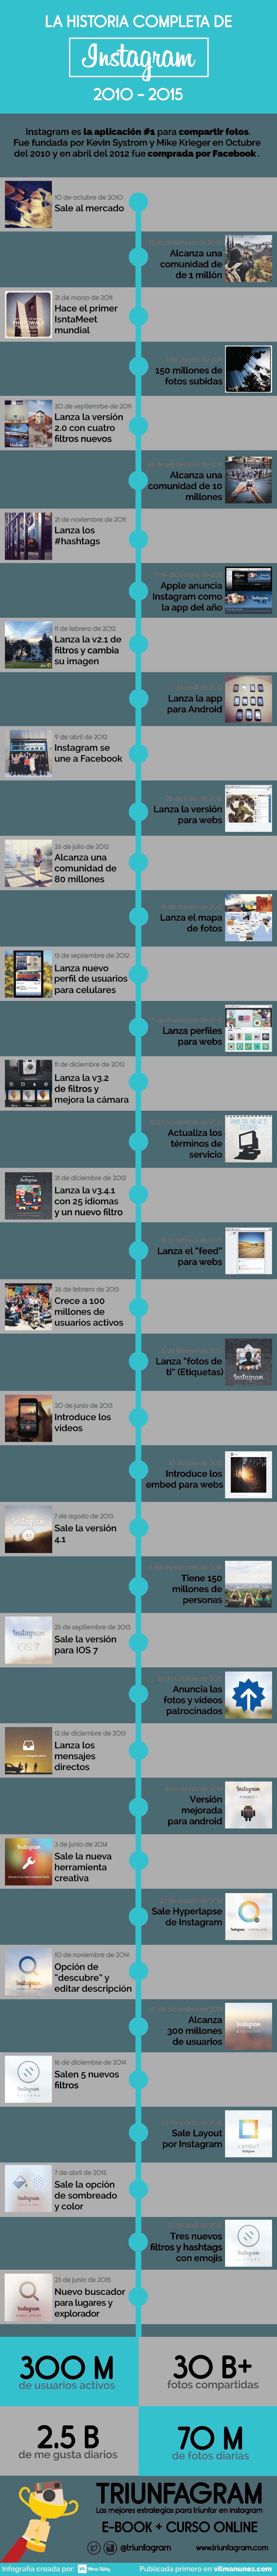 infografia-la-historia-completa-de-Instagram